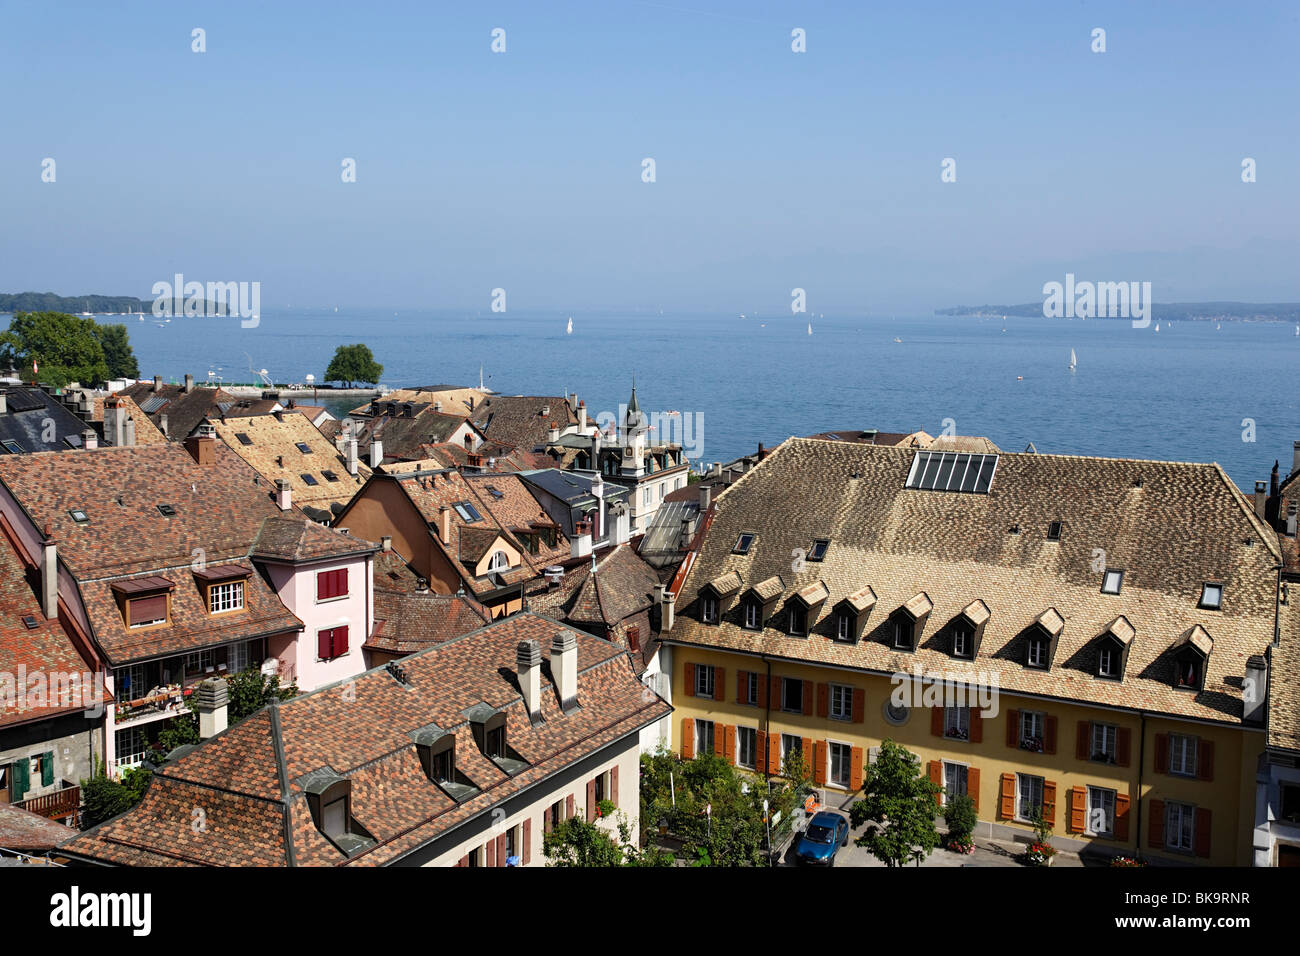 View over roofes of Nyon to lake Geneva, Nyon, Canton of Vaud, Switzerland - Stock Image